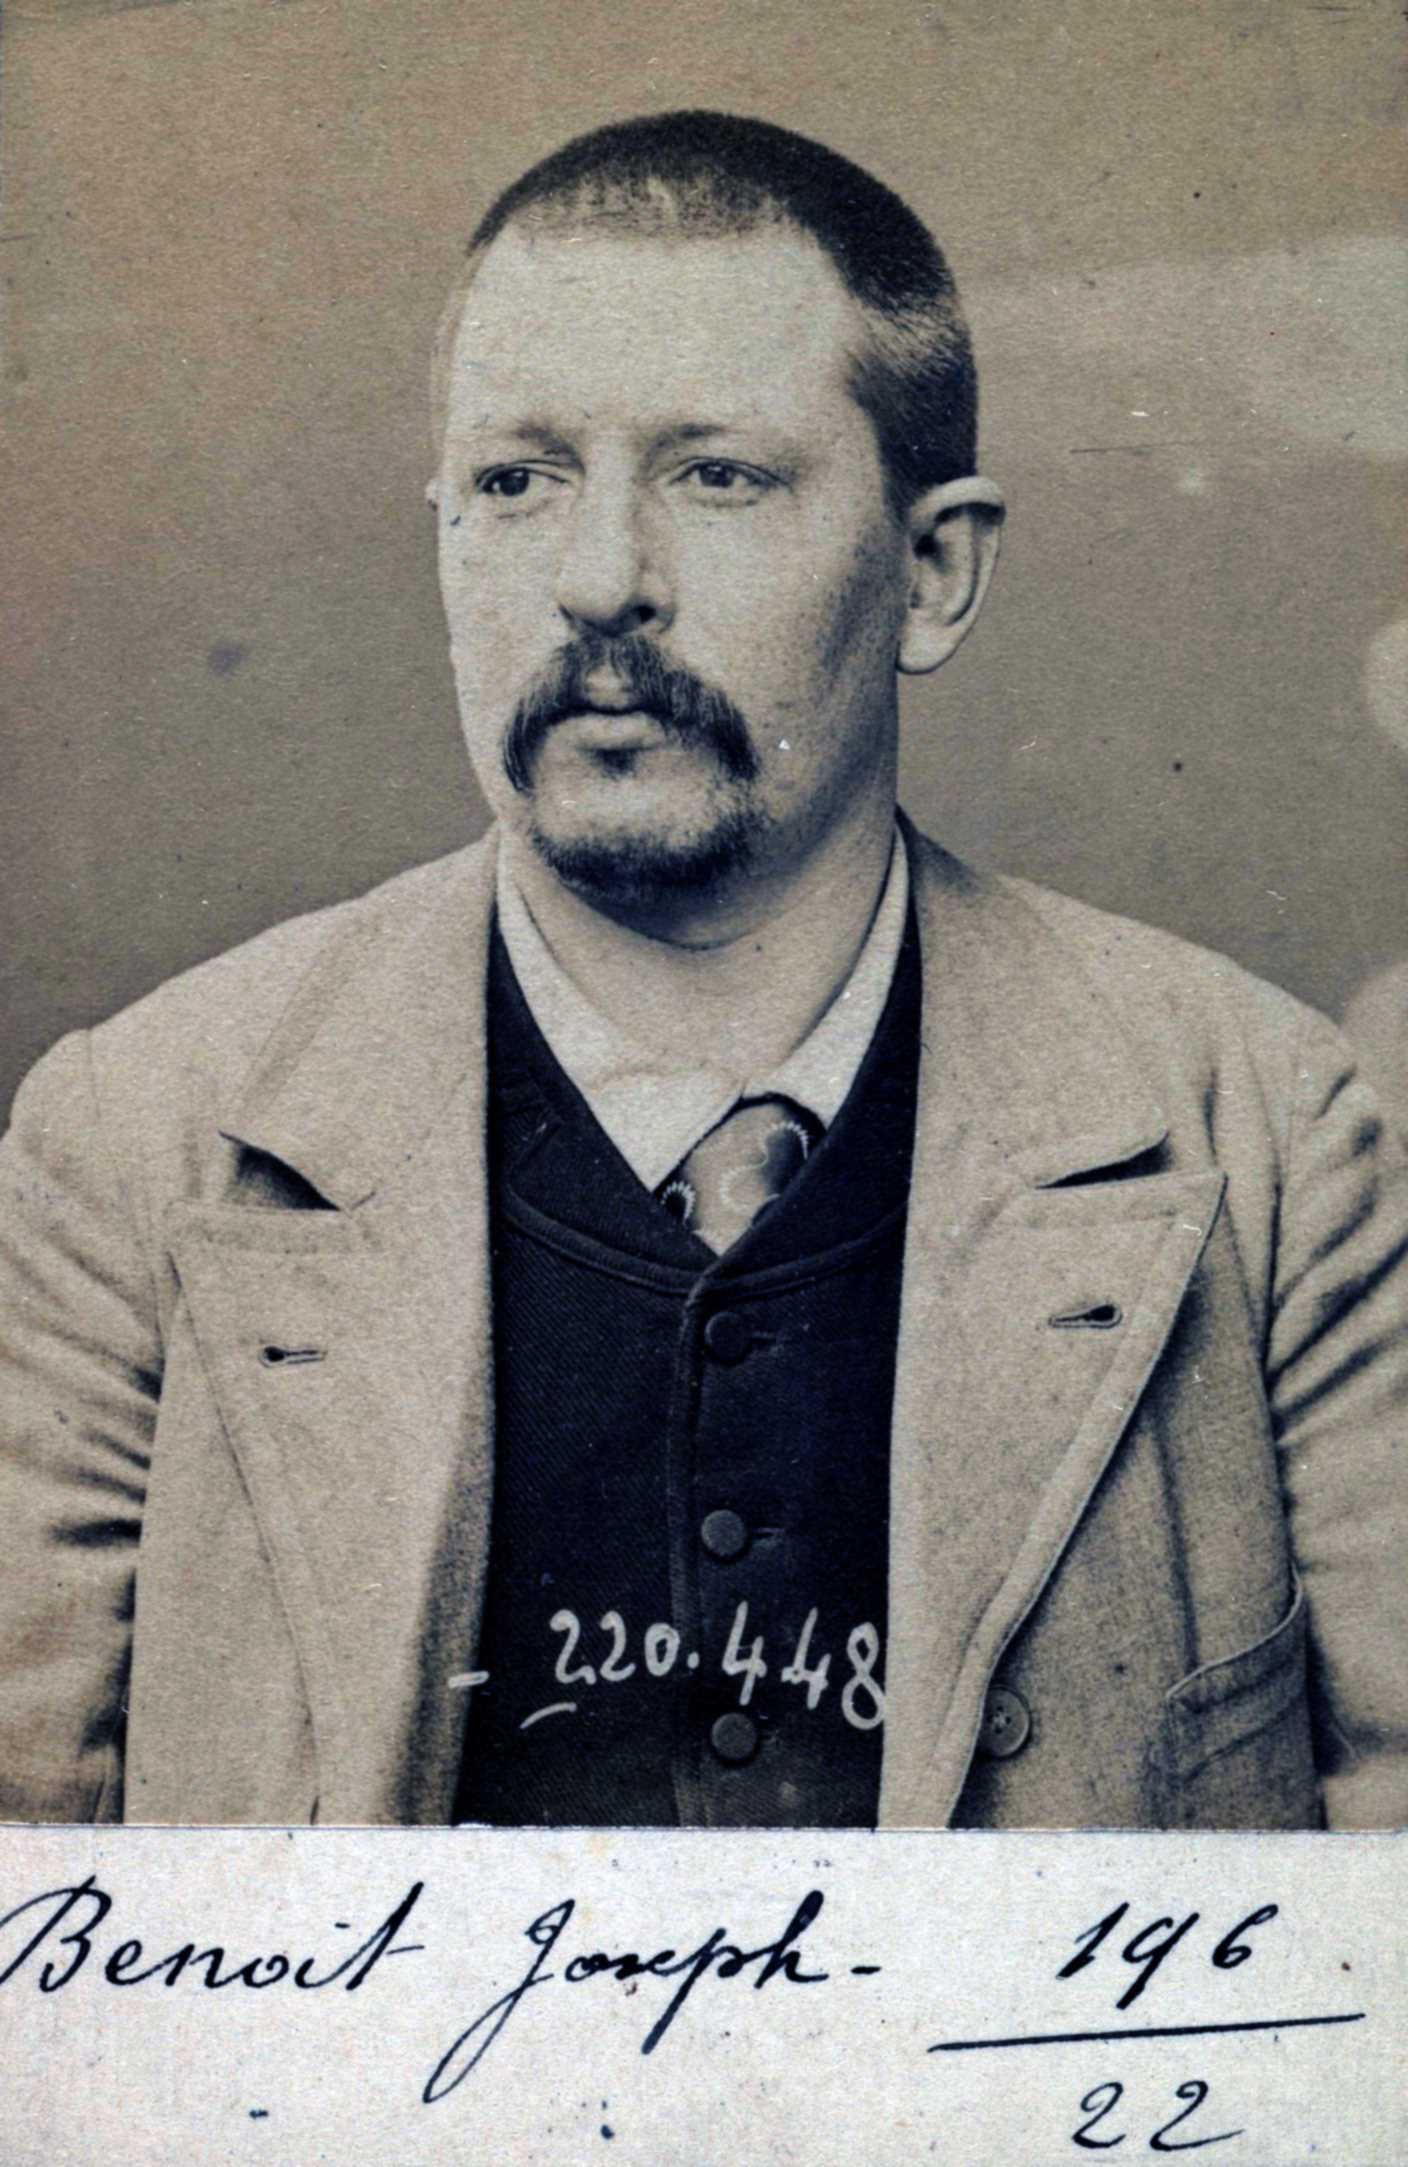 Foto policíaca de Joseph Benoit (2 de juliol de 1894)